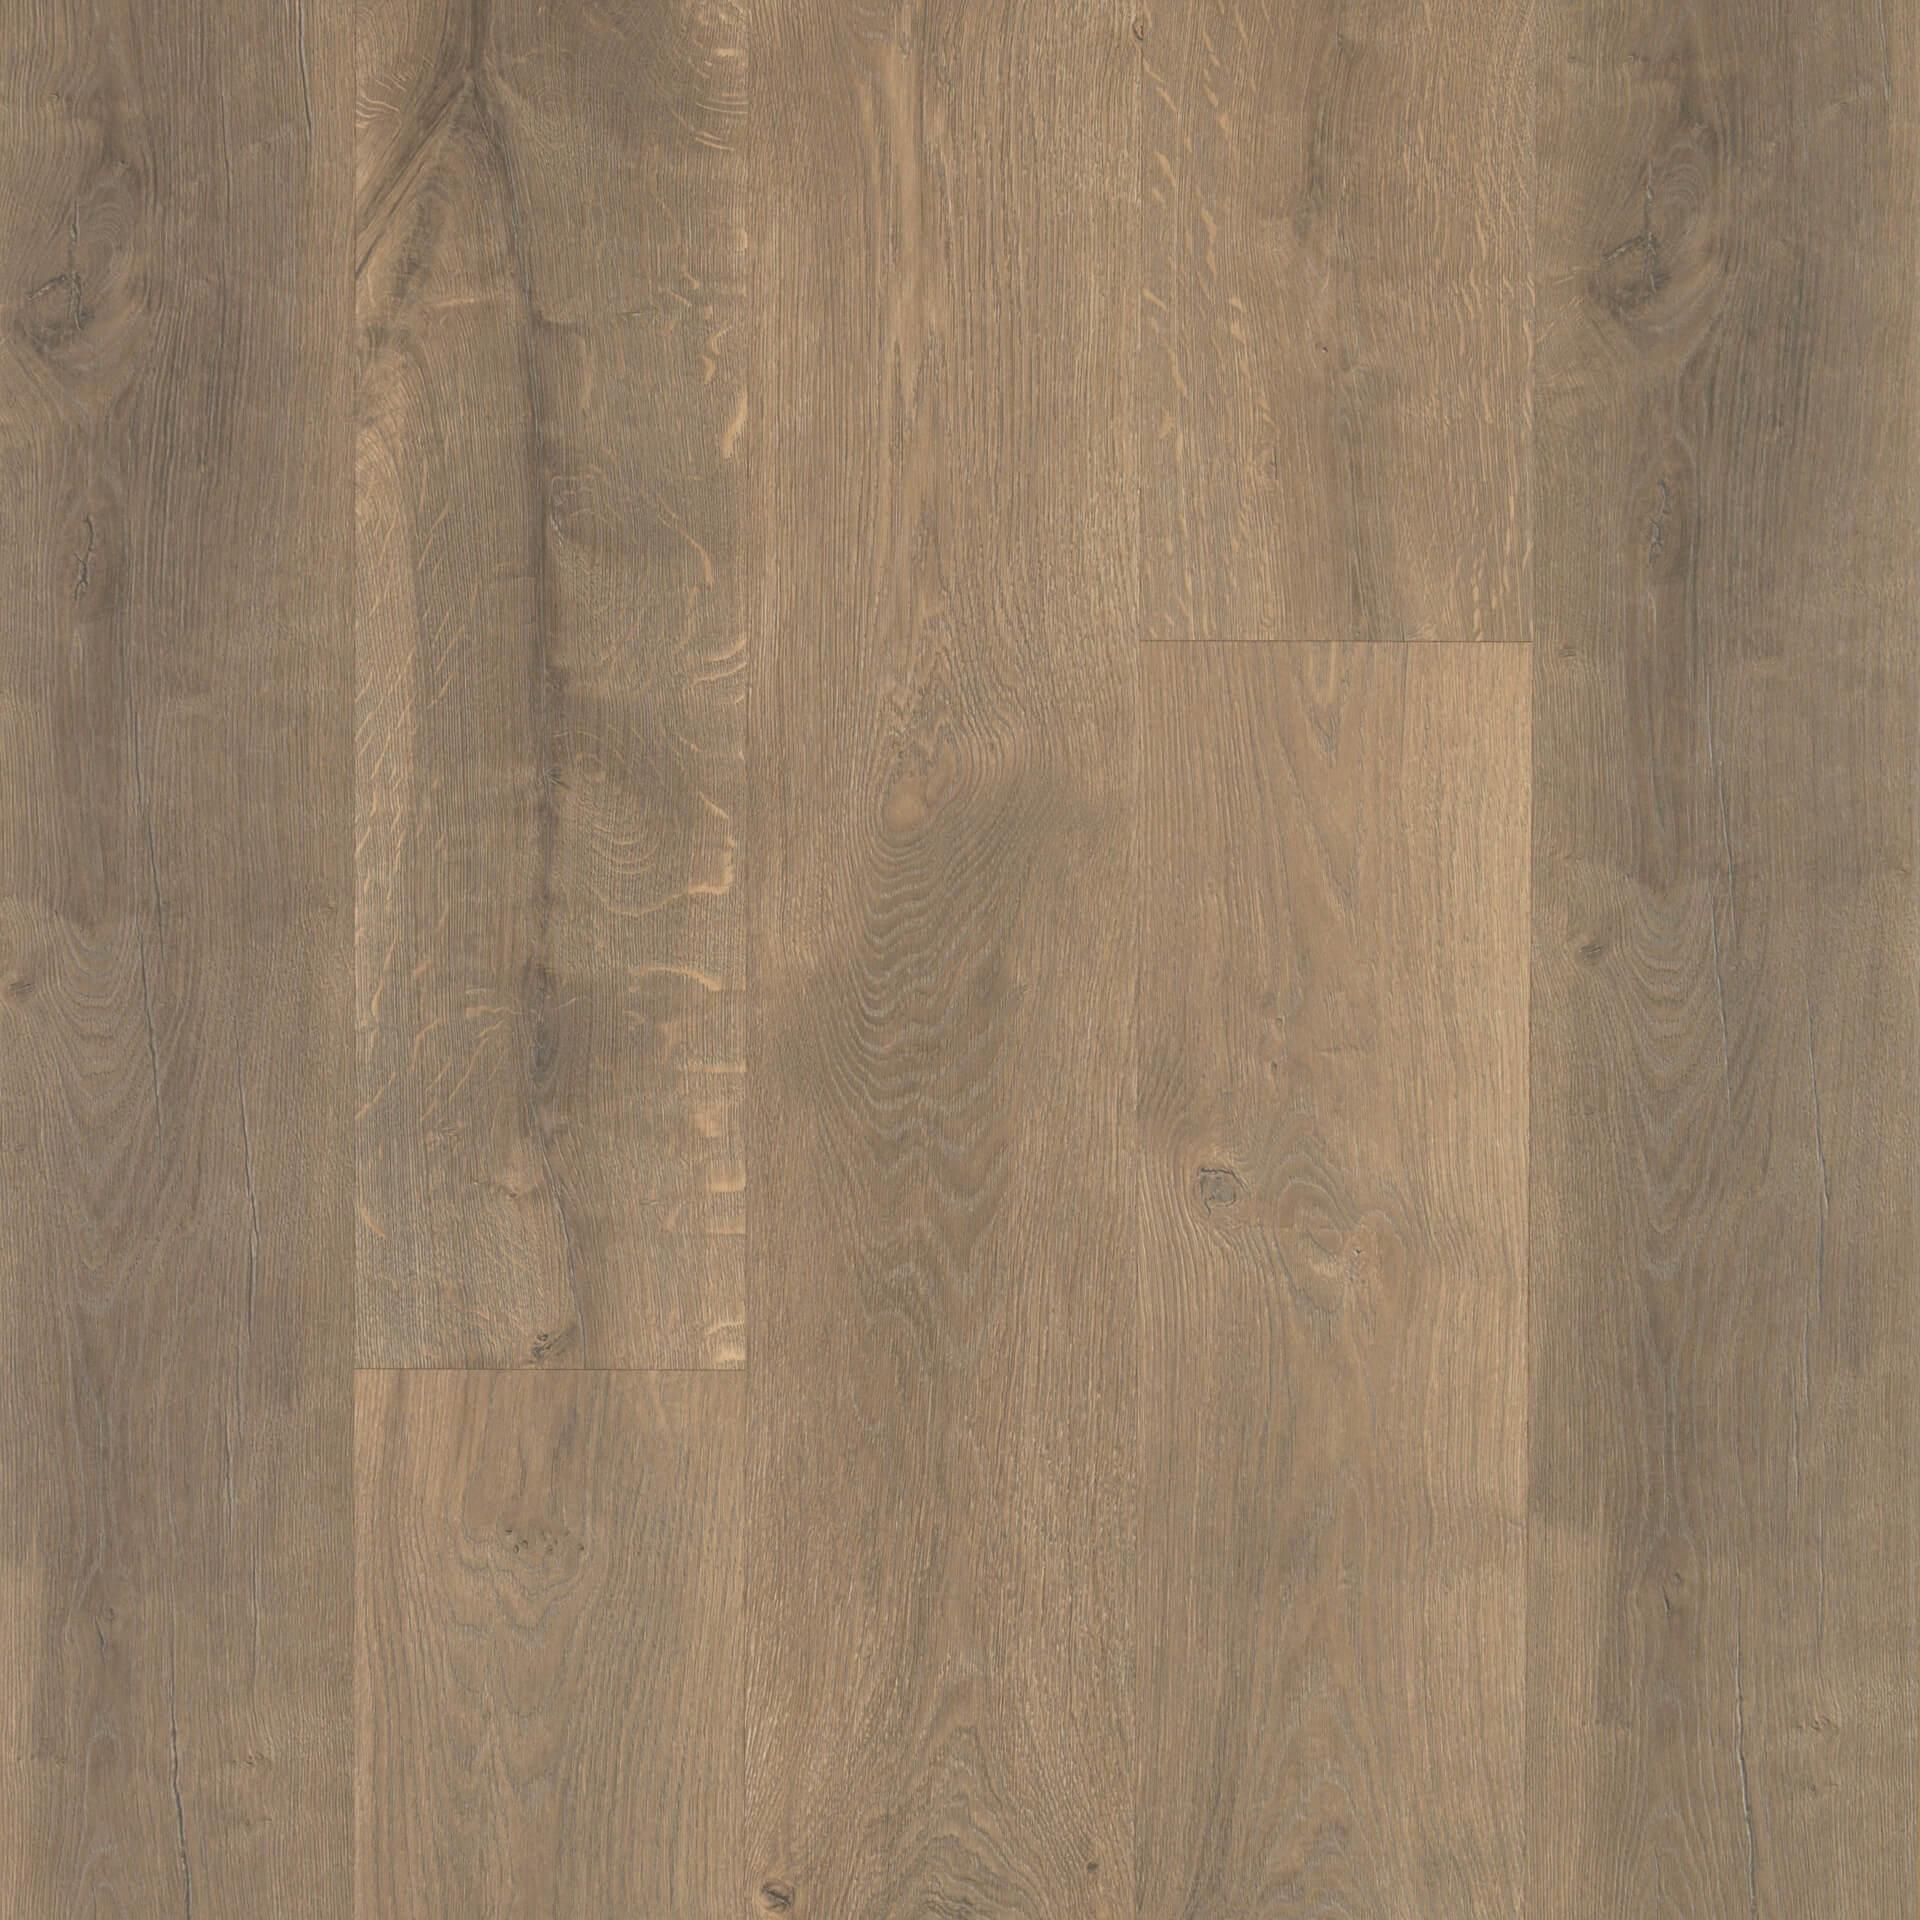 Barrel Oak Styleo Collection Laminate